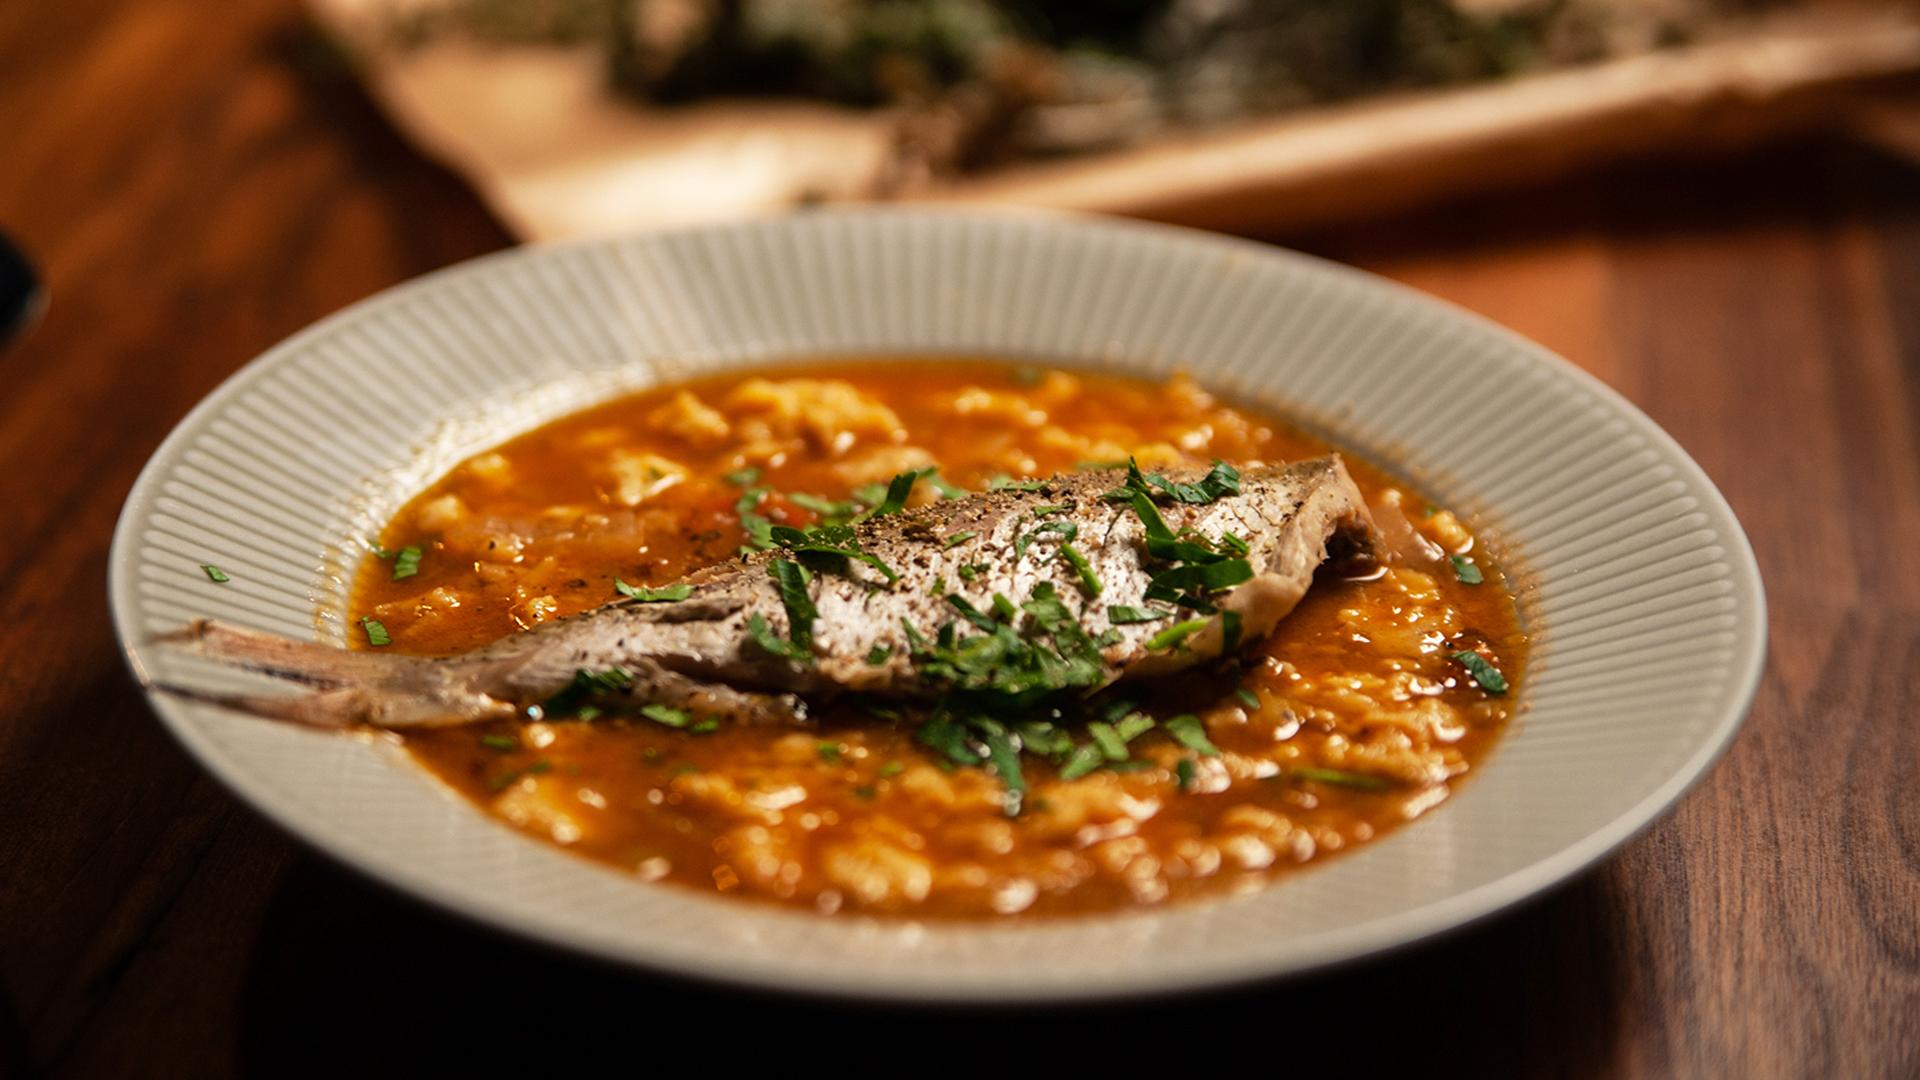 Zupa rybacka na płotkach